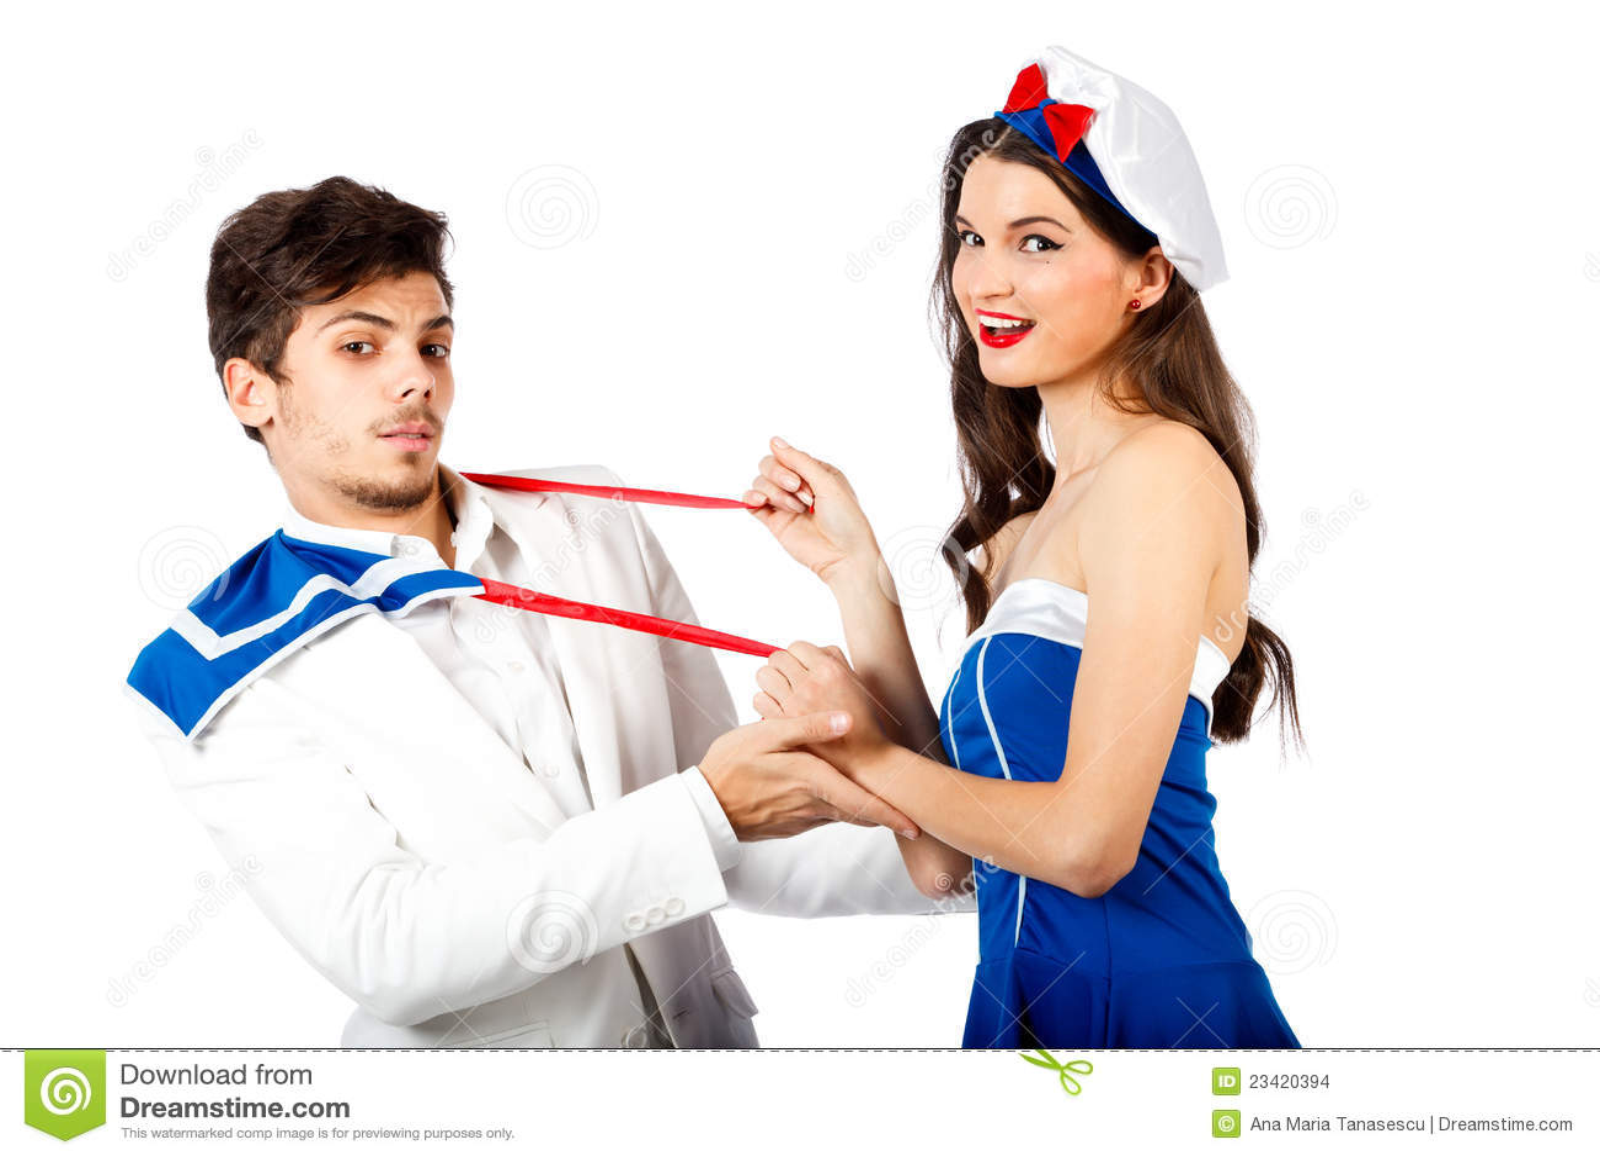 Sailor Woman Seducing Elegant Young Man Stock Images -7863